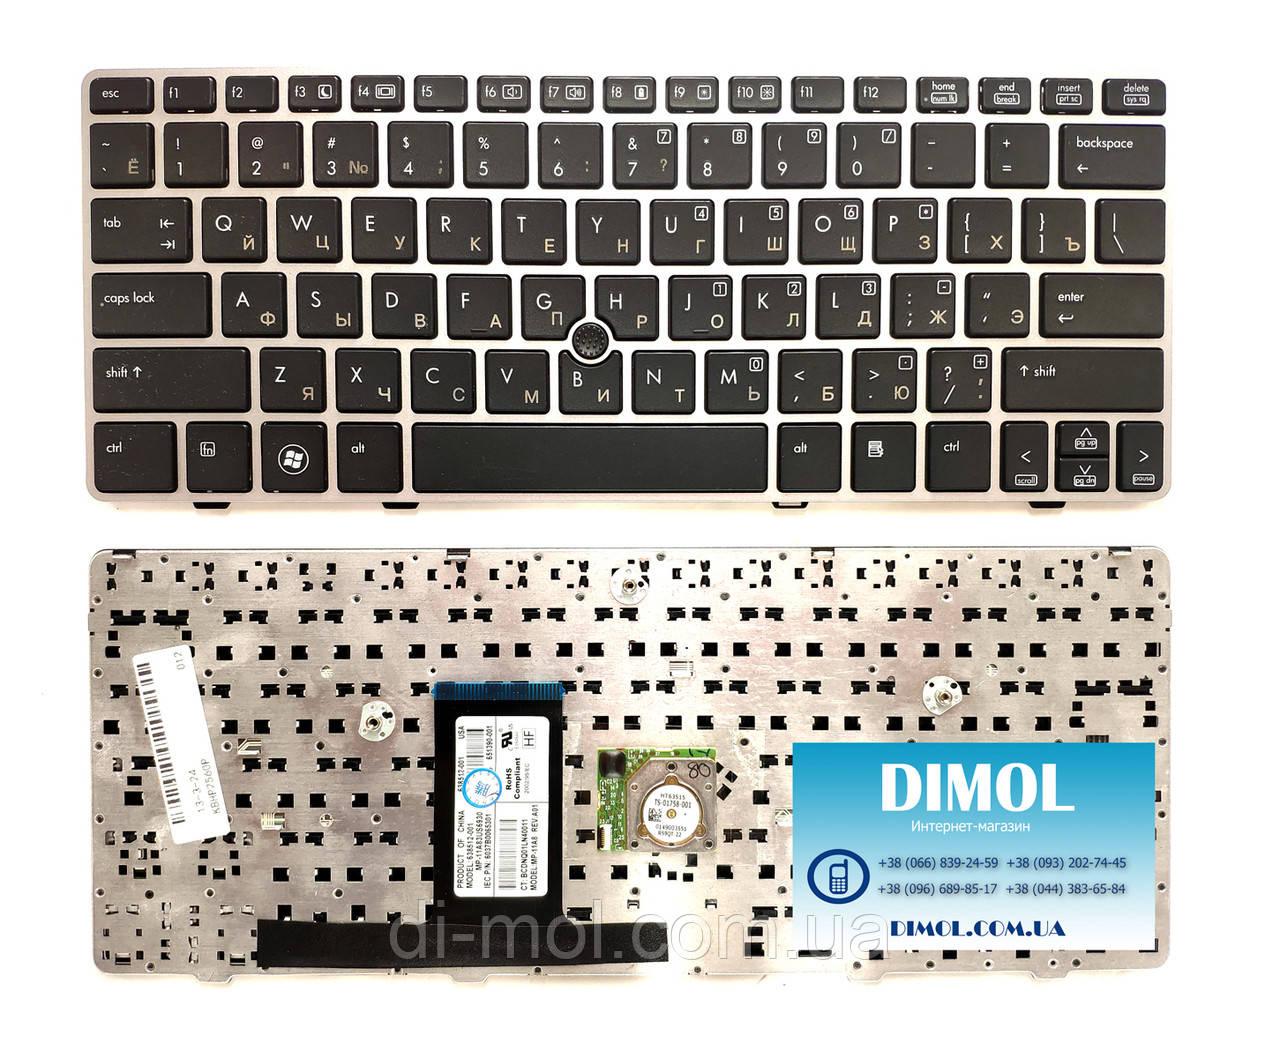 Оригинальная клавиатура для HP EliteBook 2560P, 2570P series, ru, black, серебристая рамка